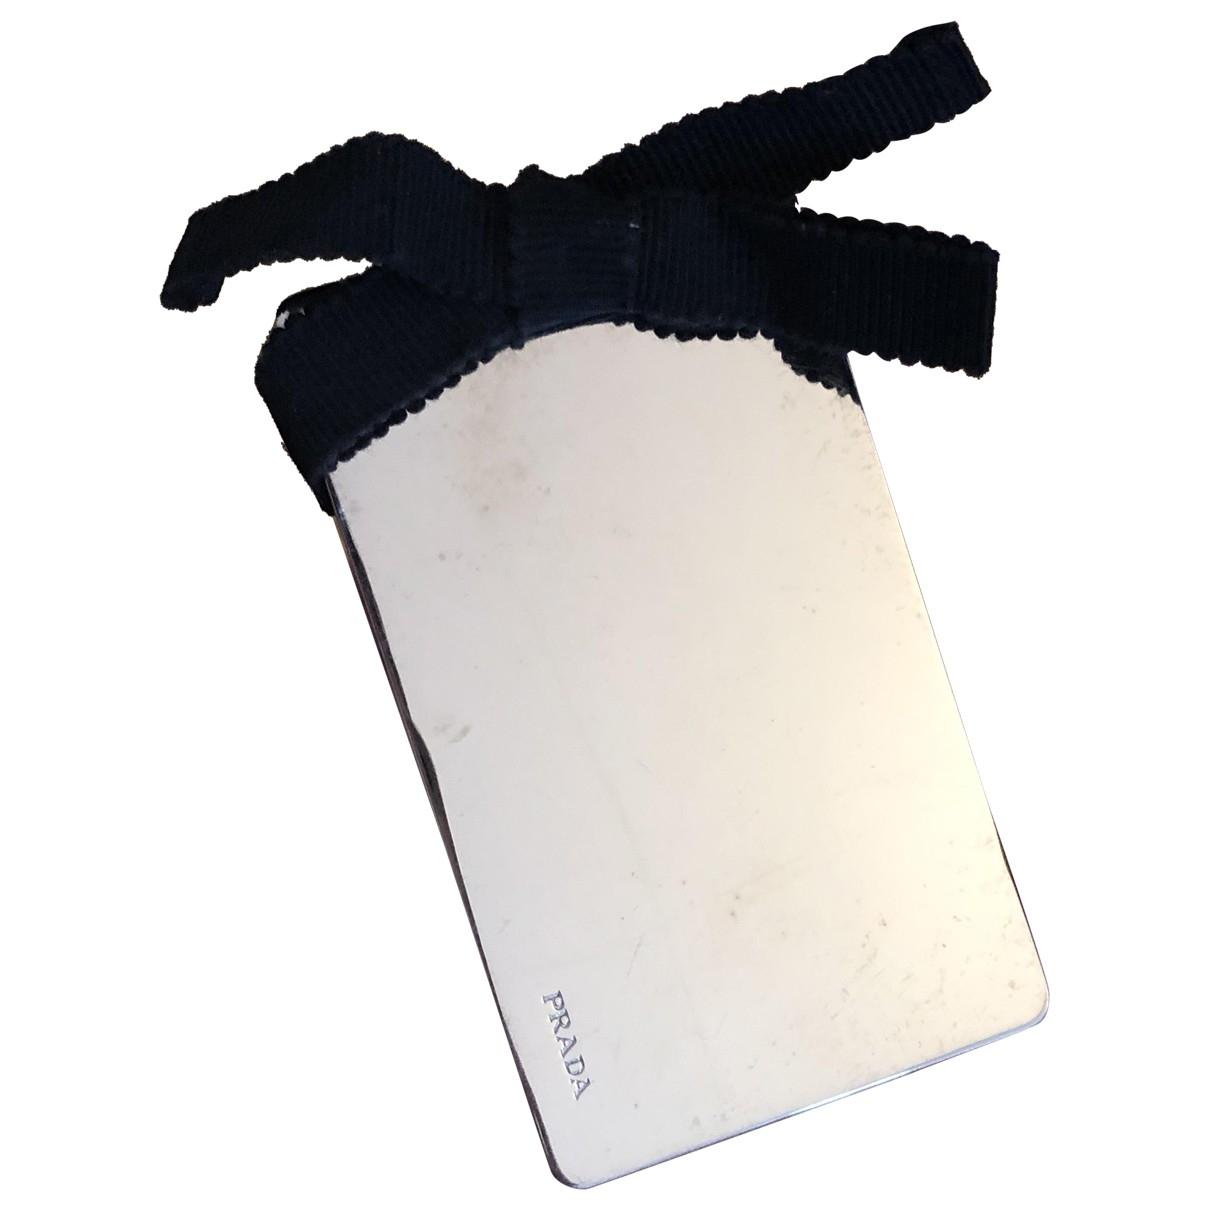 Prada - Bijoux de sac   pour femme en metal - argente